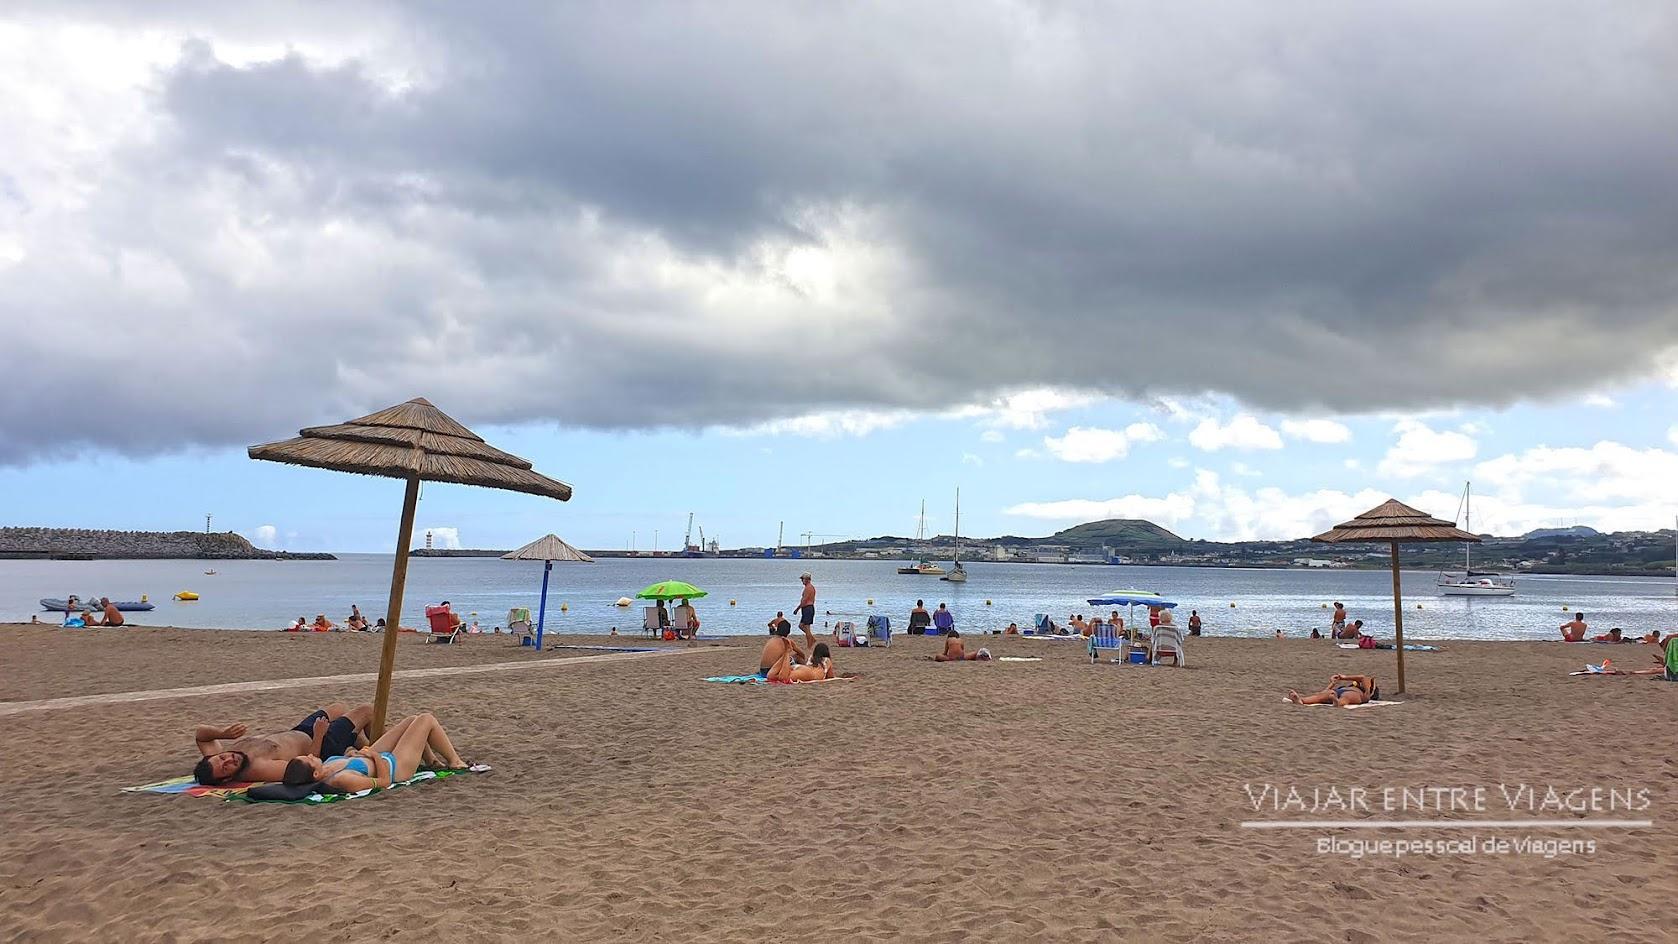 Experimentar o extenso areal na Praia da Vitória, na ilha Terceira